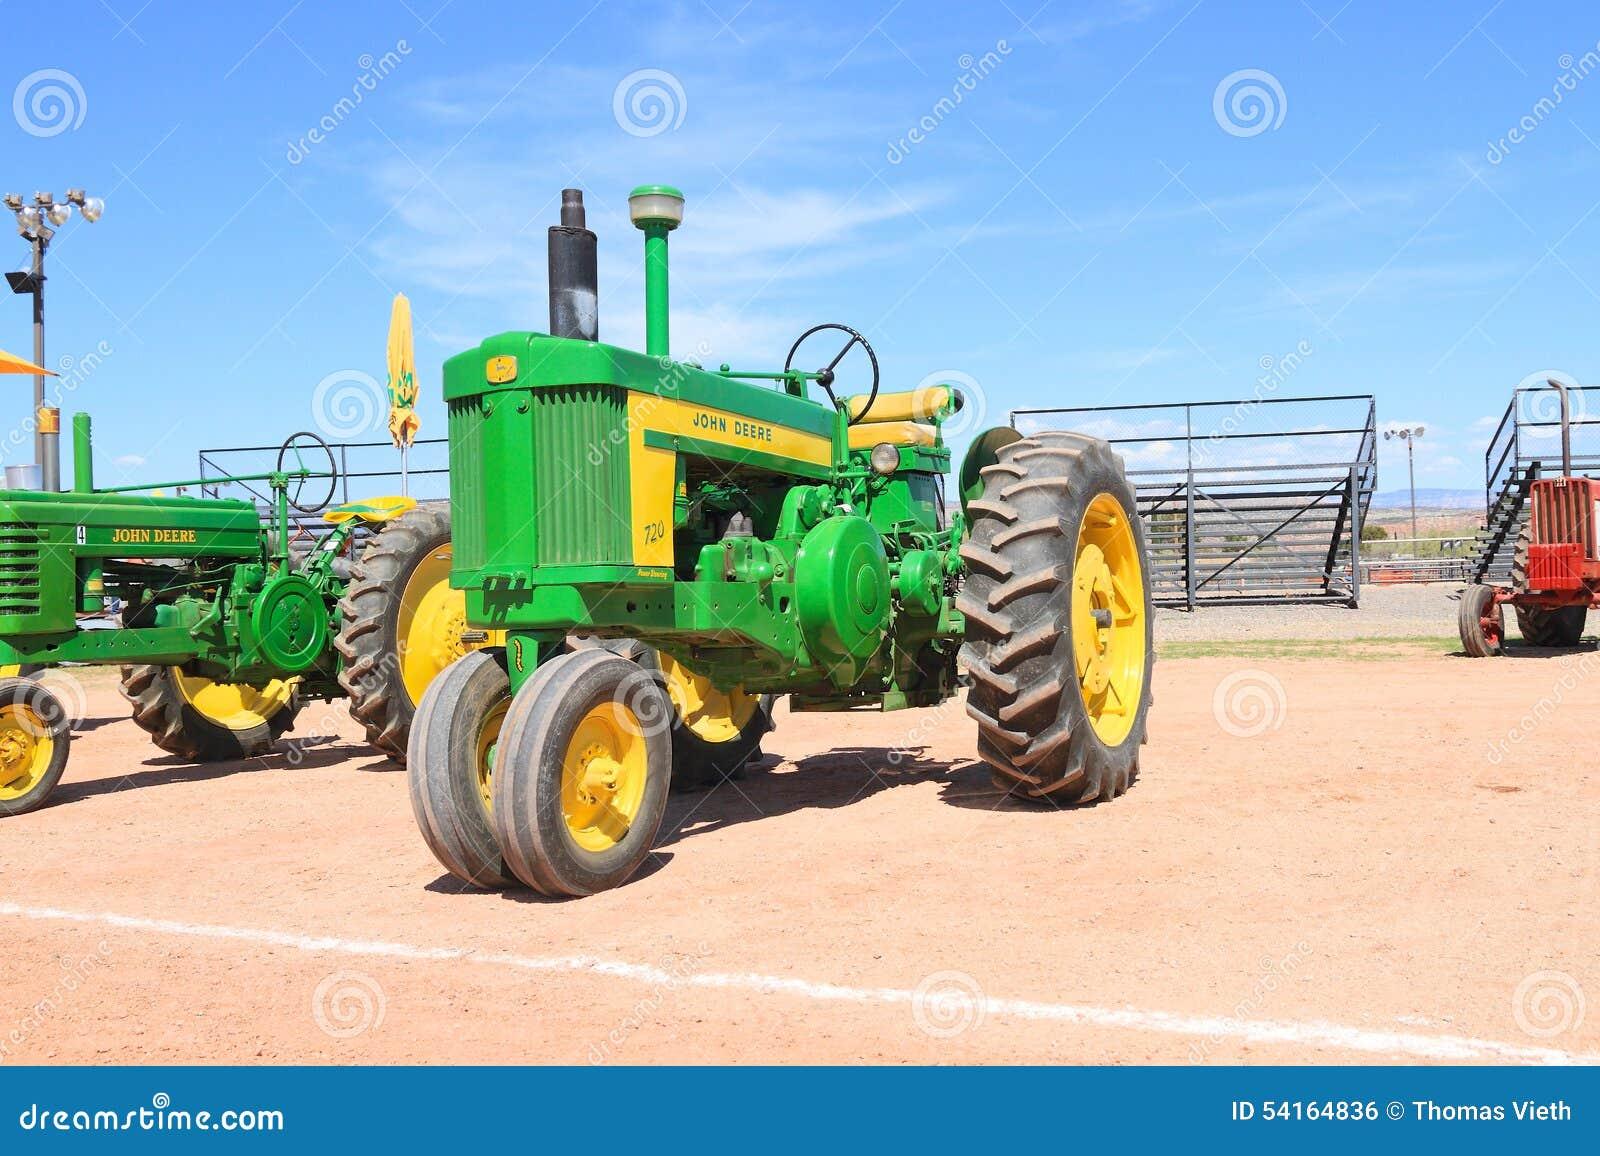 usa classic tractor john deere model 720 195658